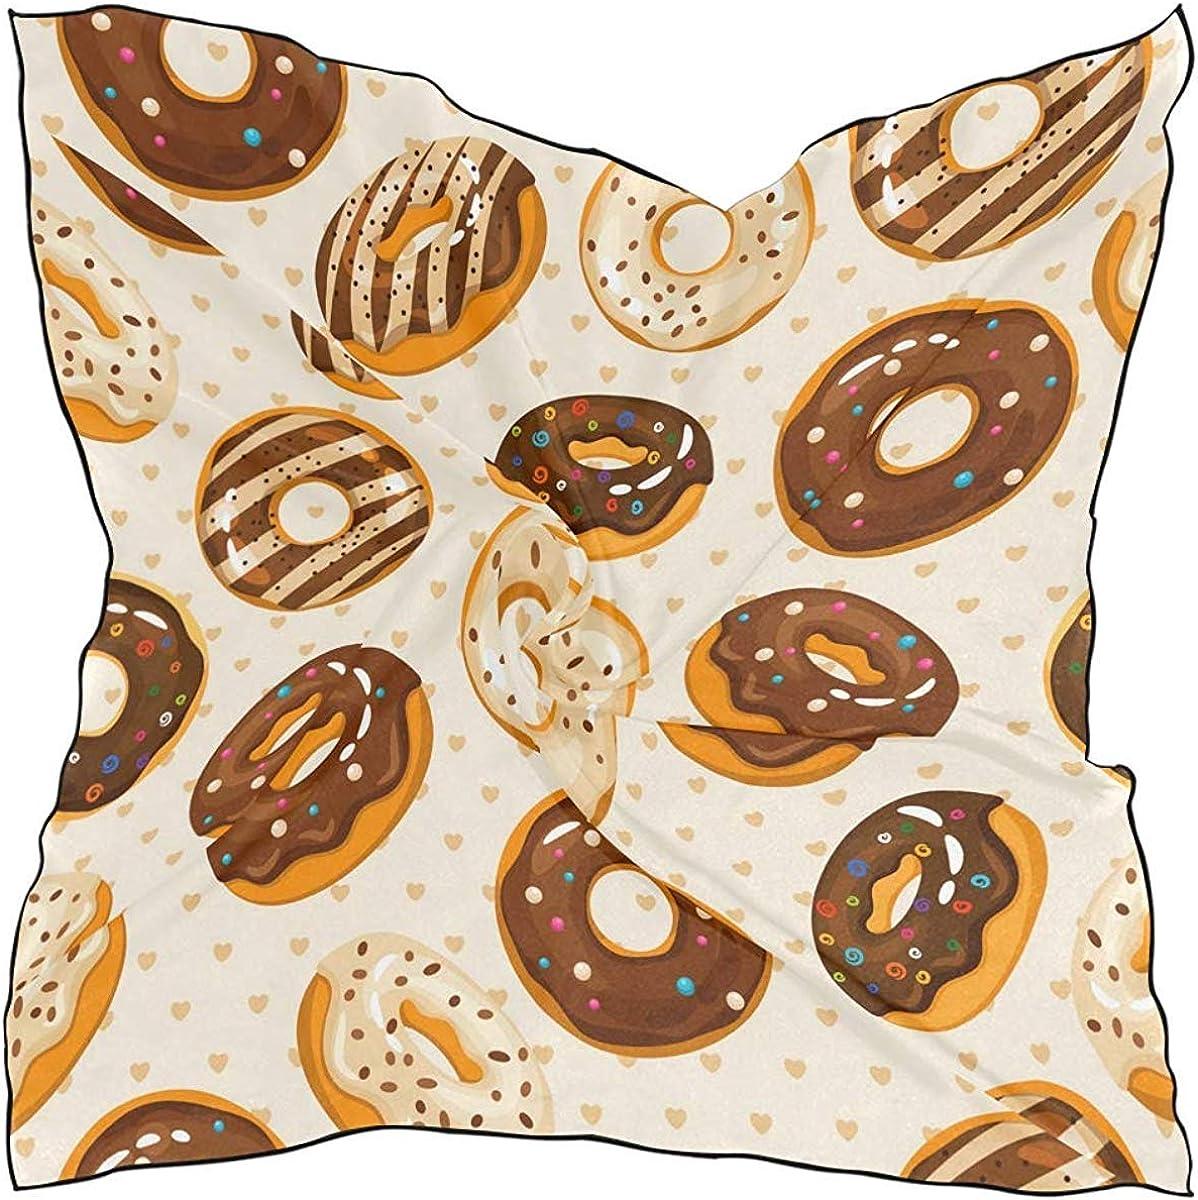 Fashion Silk Scarf Large Square Satin kerchief life Sugar Chocolate Donuts for Women Head scarf Multipurpose Headpiece